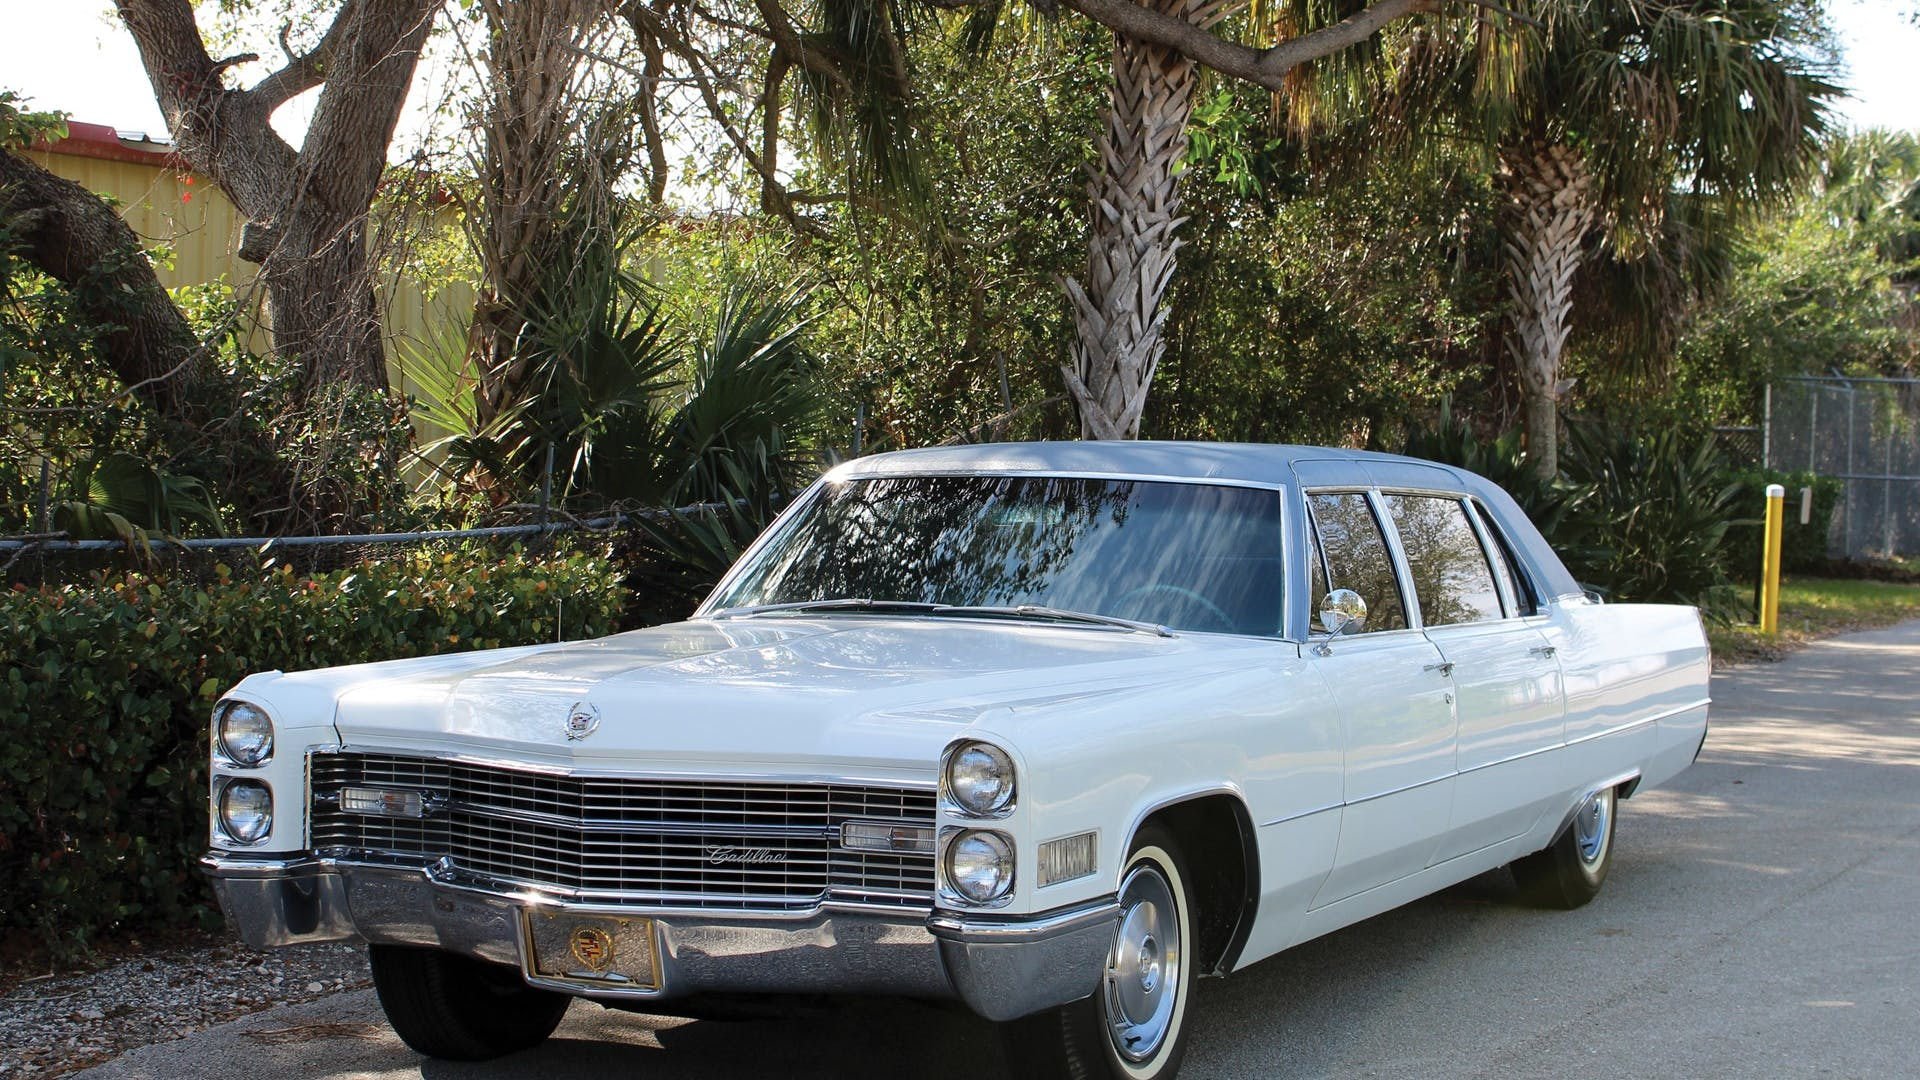 1966 Cadillac Fleetwood 75 Nine-Passenger Sedan